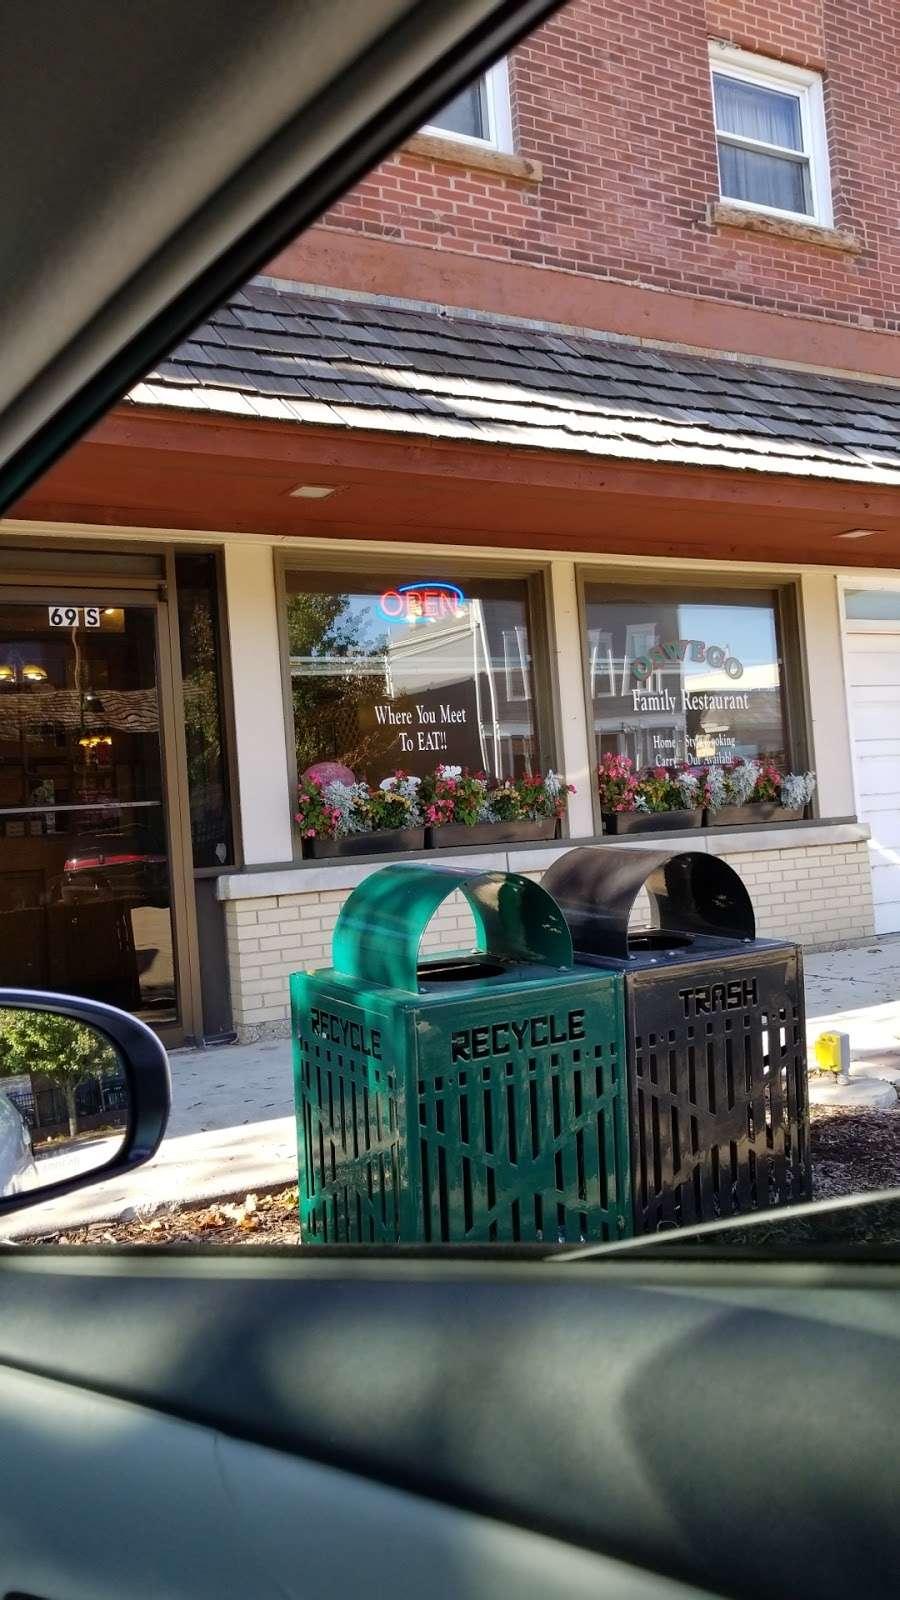 Oswego Family Restaurant - restaurant  | Photo 3 of 10 | Address: 69 Main St, Oswego, IL 60543, USA | Phone: (630) 554-0340